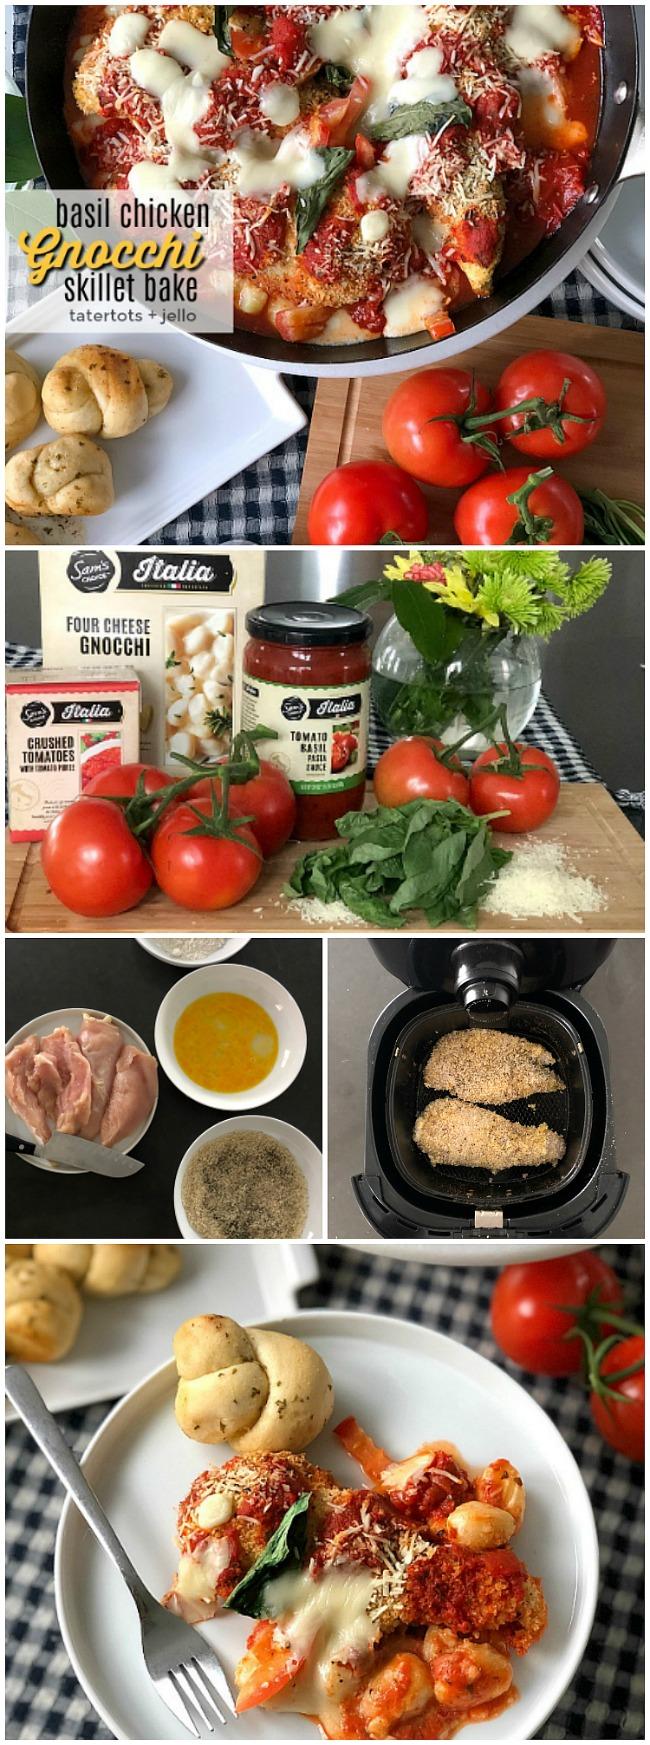 Basil Chicken Gnocchi Skillet Bake - with @Walmart's new Sam's Choice Italia line. Basil Chicken Gnocchi Skillet Bake. Layers of tomato basil pasta sauce, creamy gnocchi, crispy breaded chicken, fresh basil and gooey cheese are baked for a hearty Italian dish everyone loves! #sponsored #WalmartWOW #ItalianRecipe #RecipeKidsLove #GnocchiRecipe